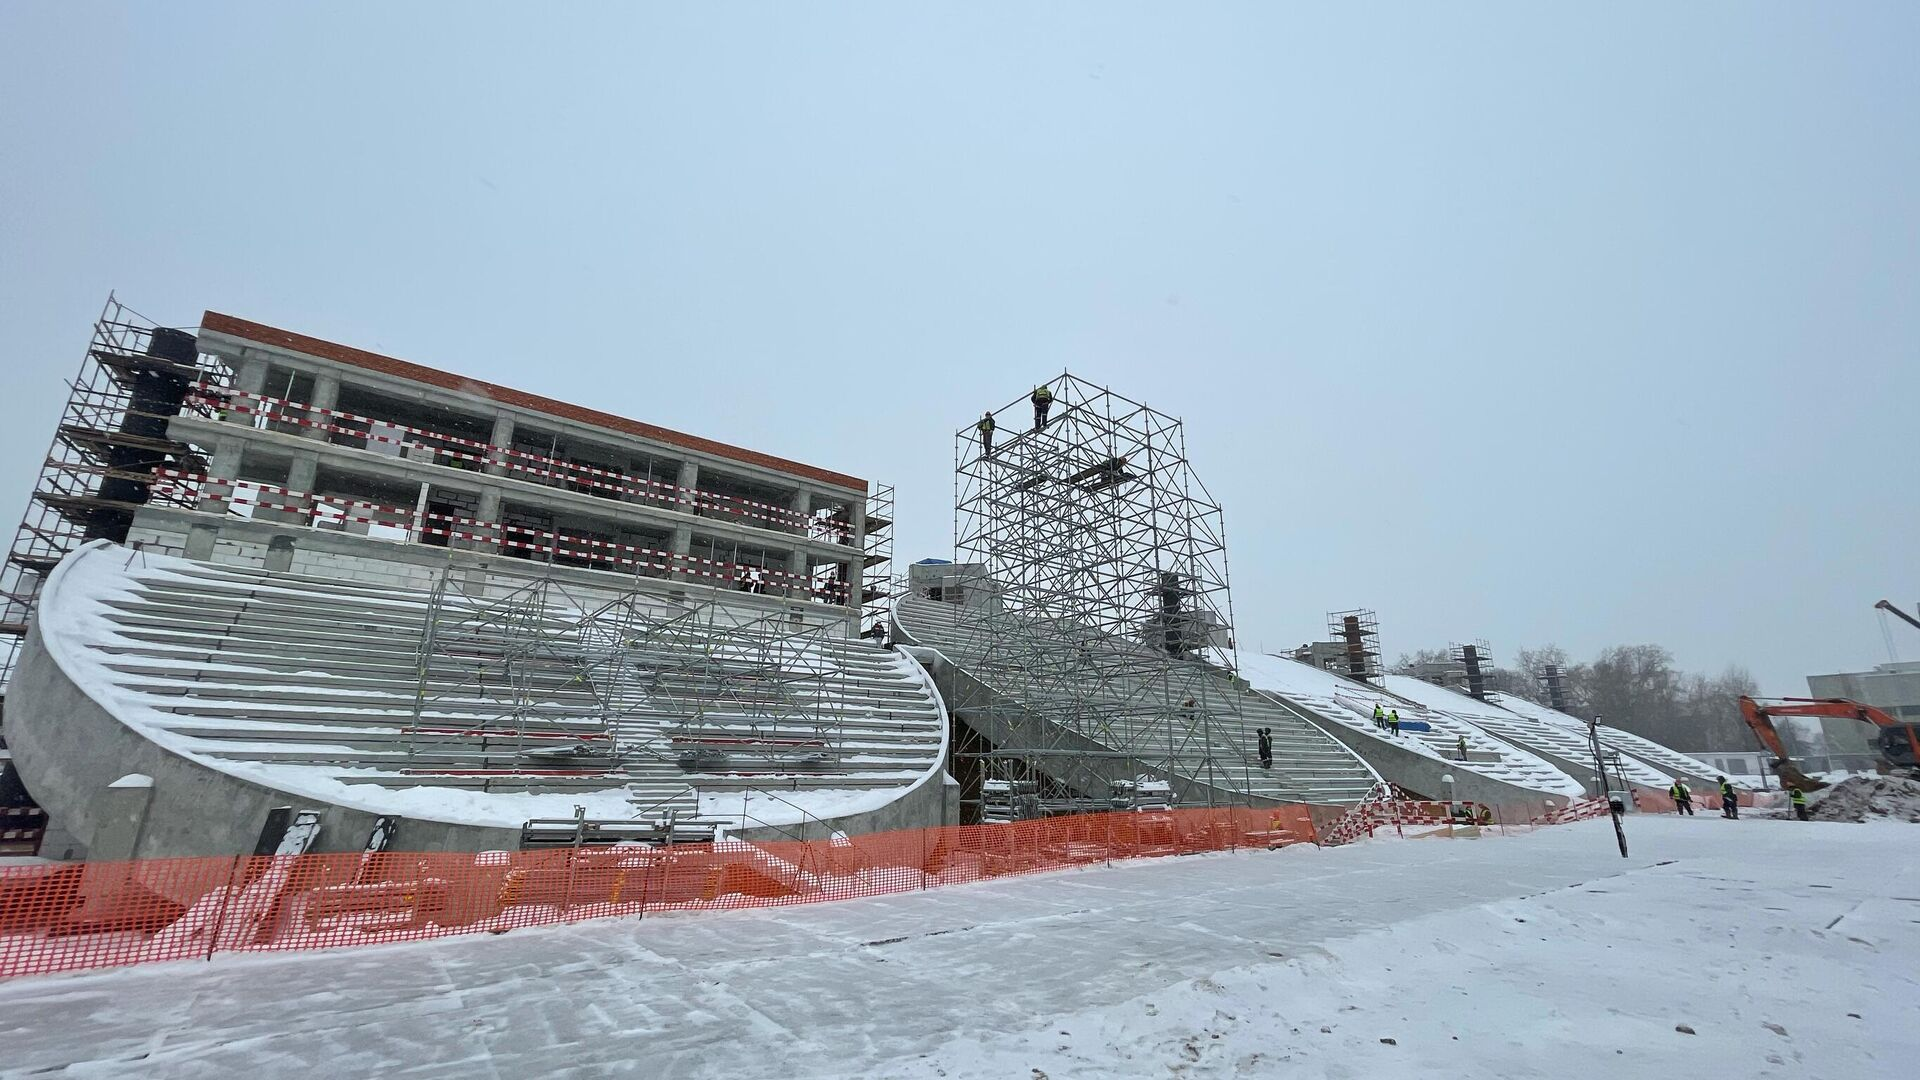 Реконструкция стадиона Москвич - РИА Новости, 1920, 21.01.2021